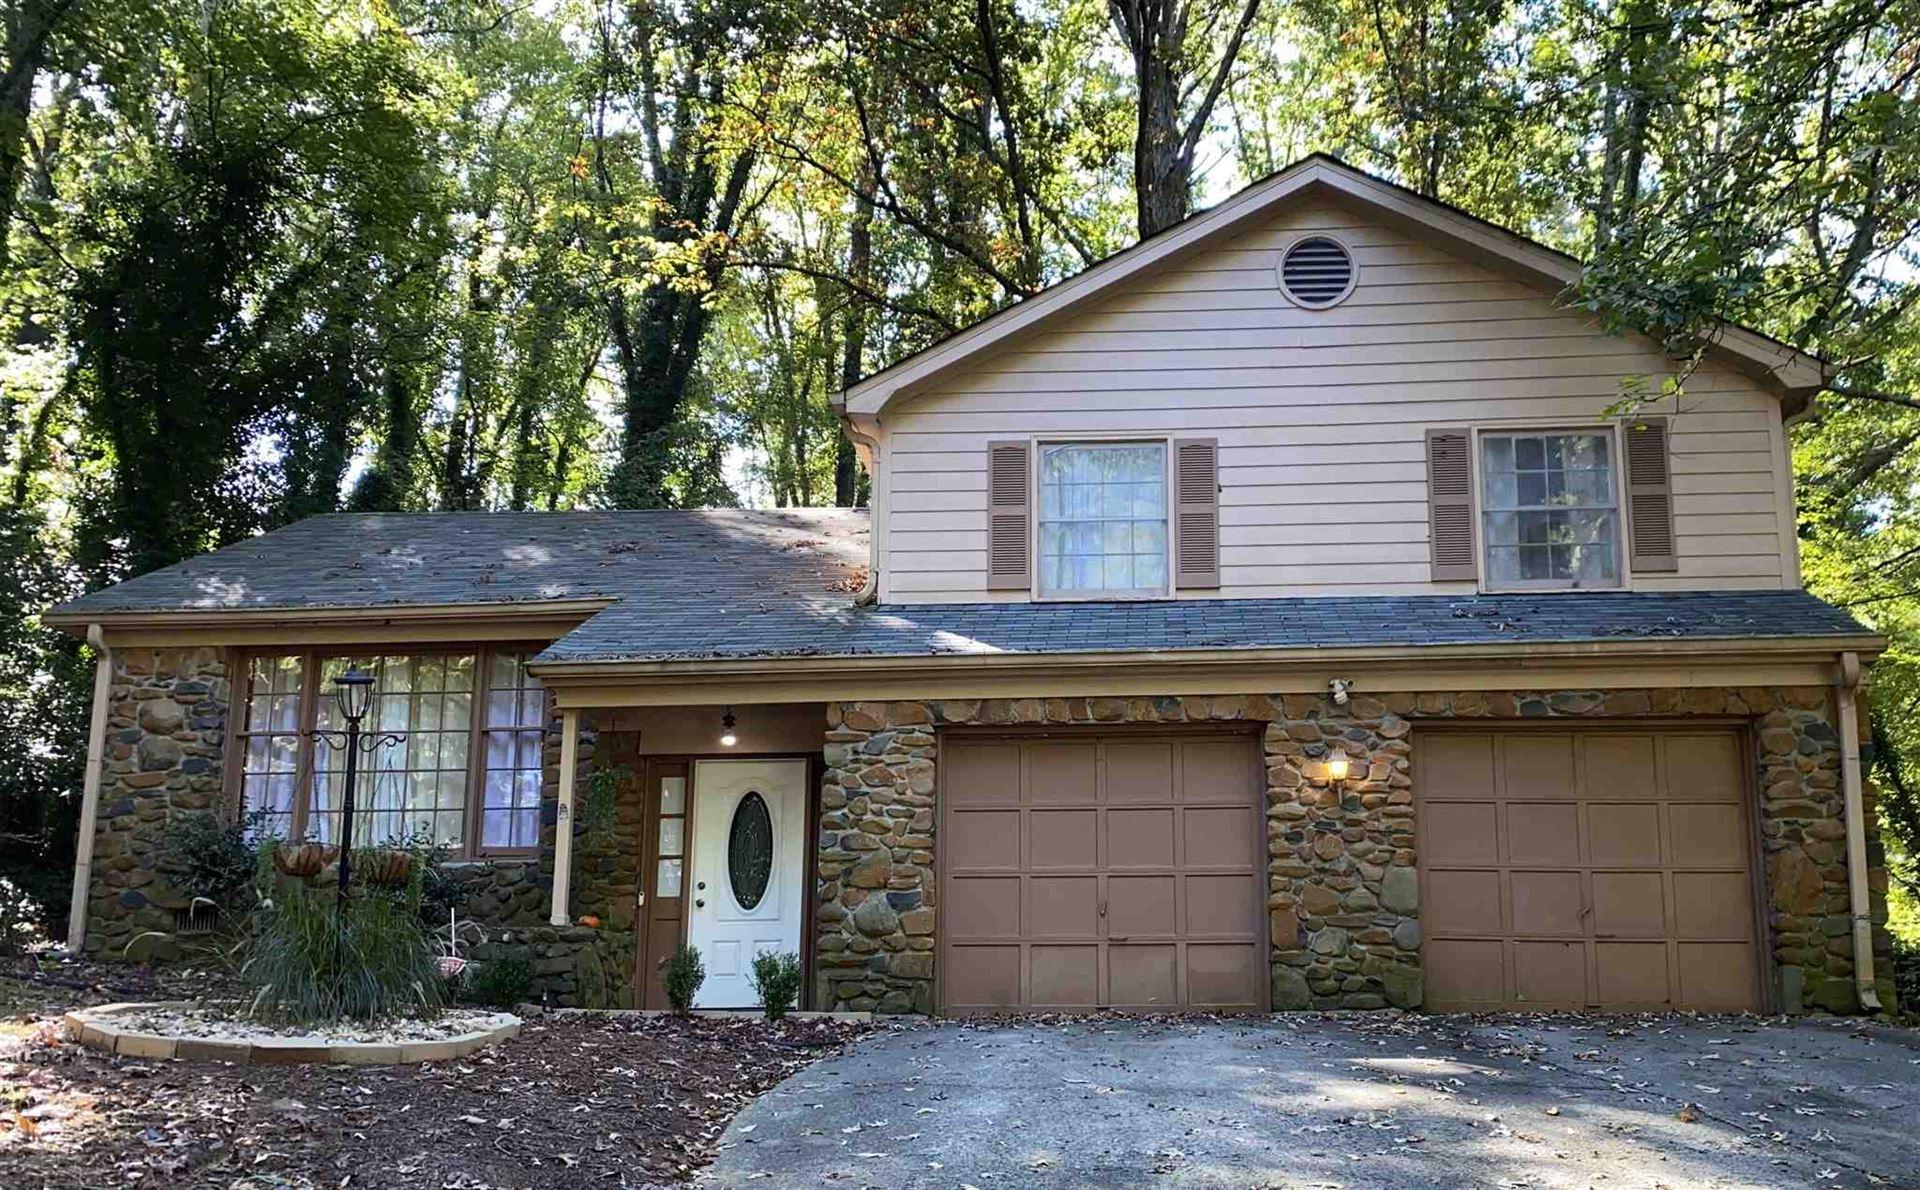 1005 Fellsridge Ct, Stone Mountain, GA 30083 - MLS#: 8876447